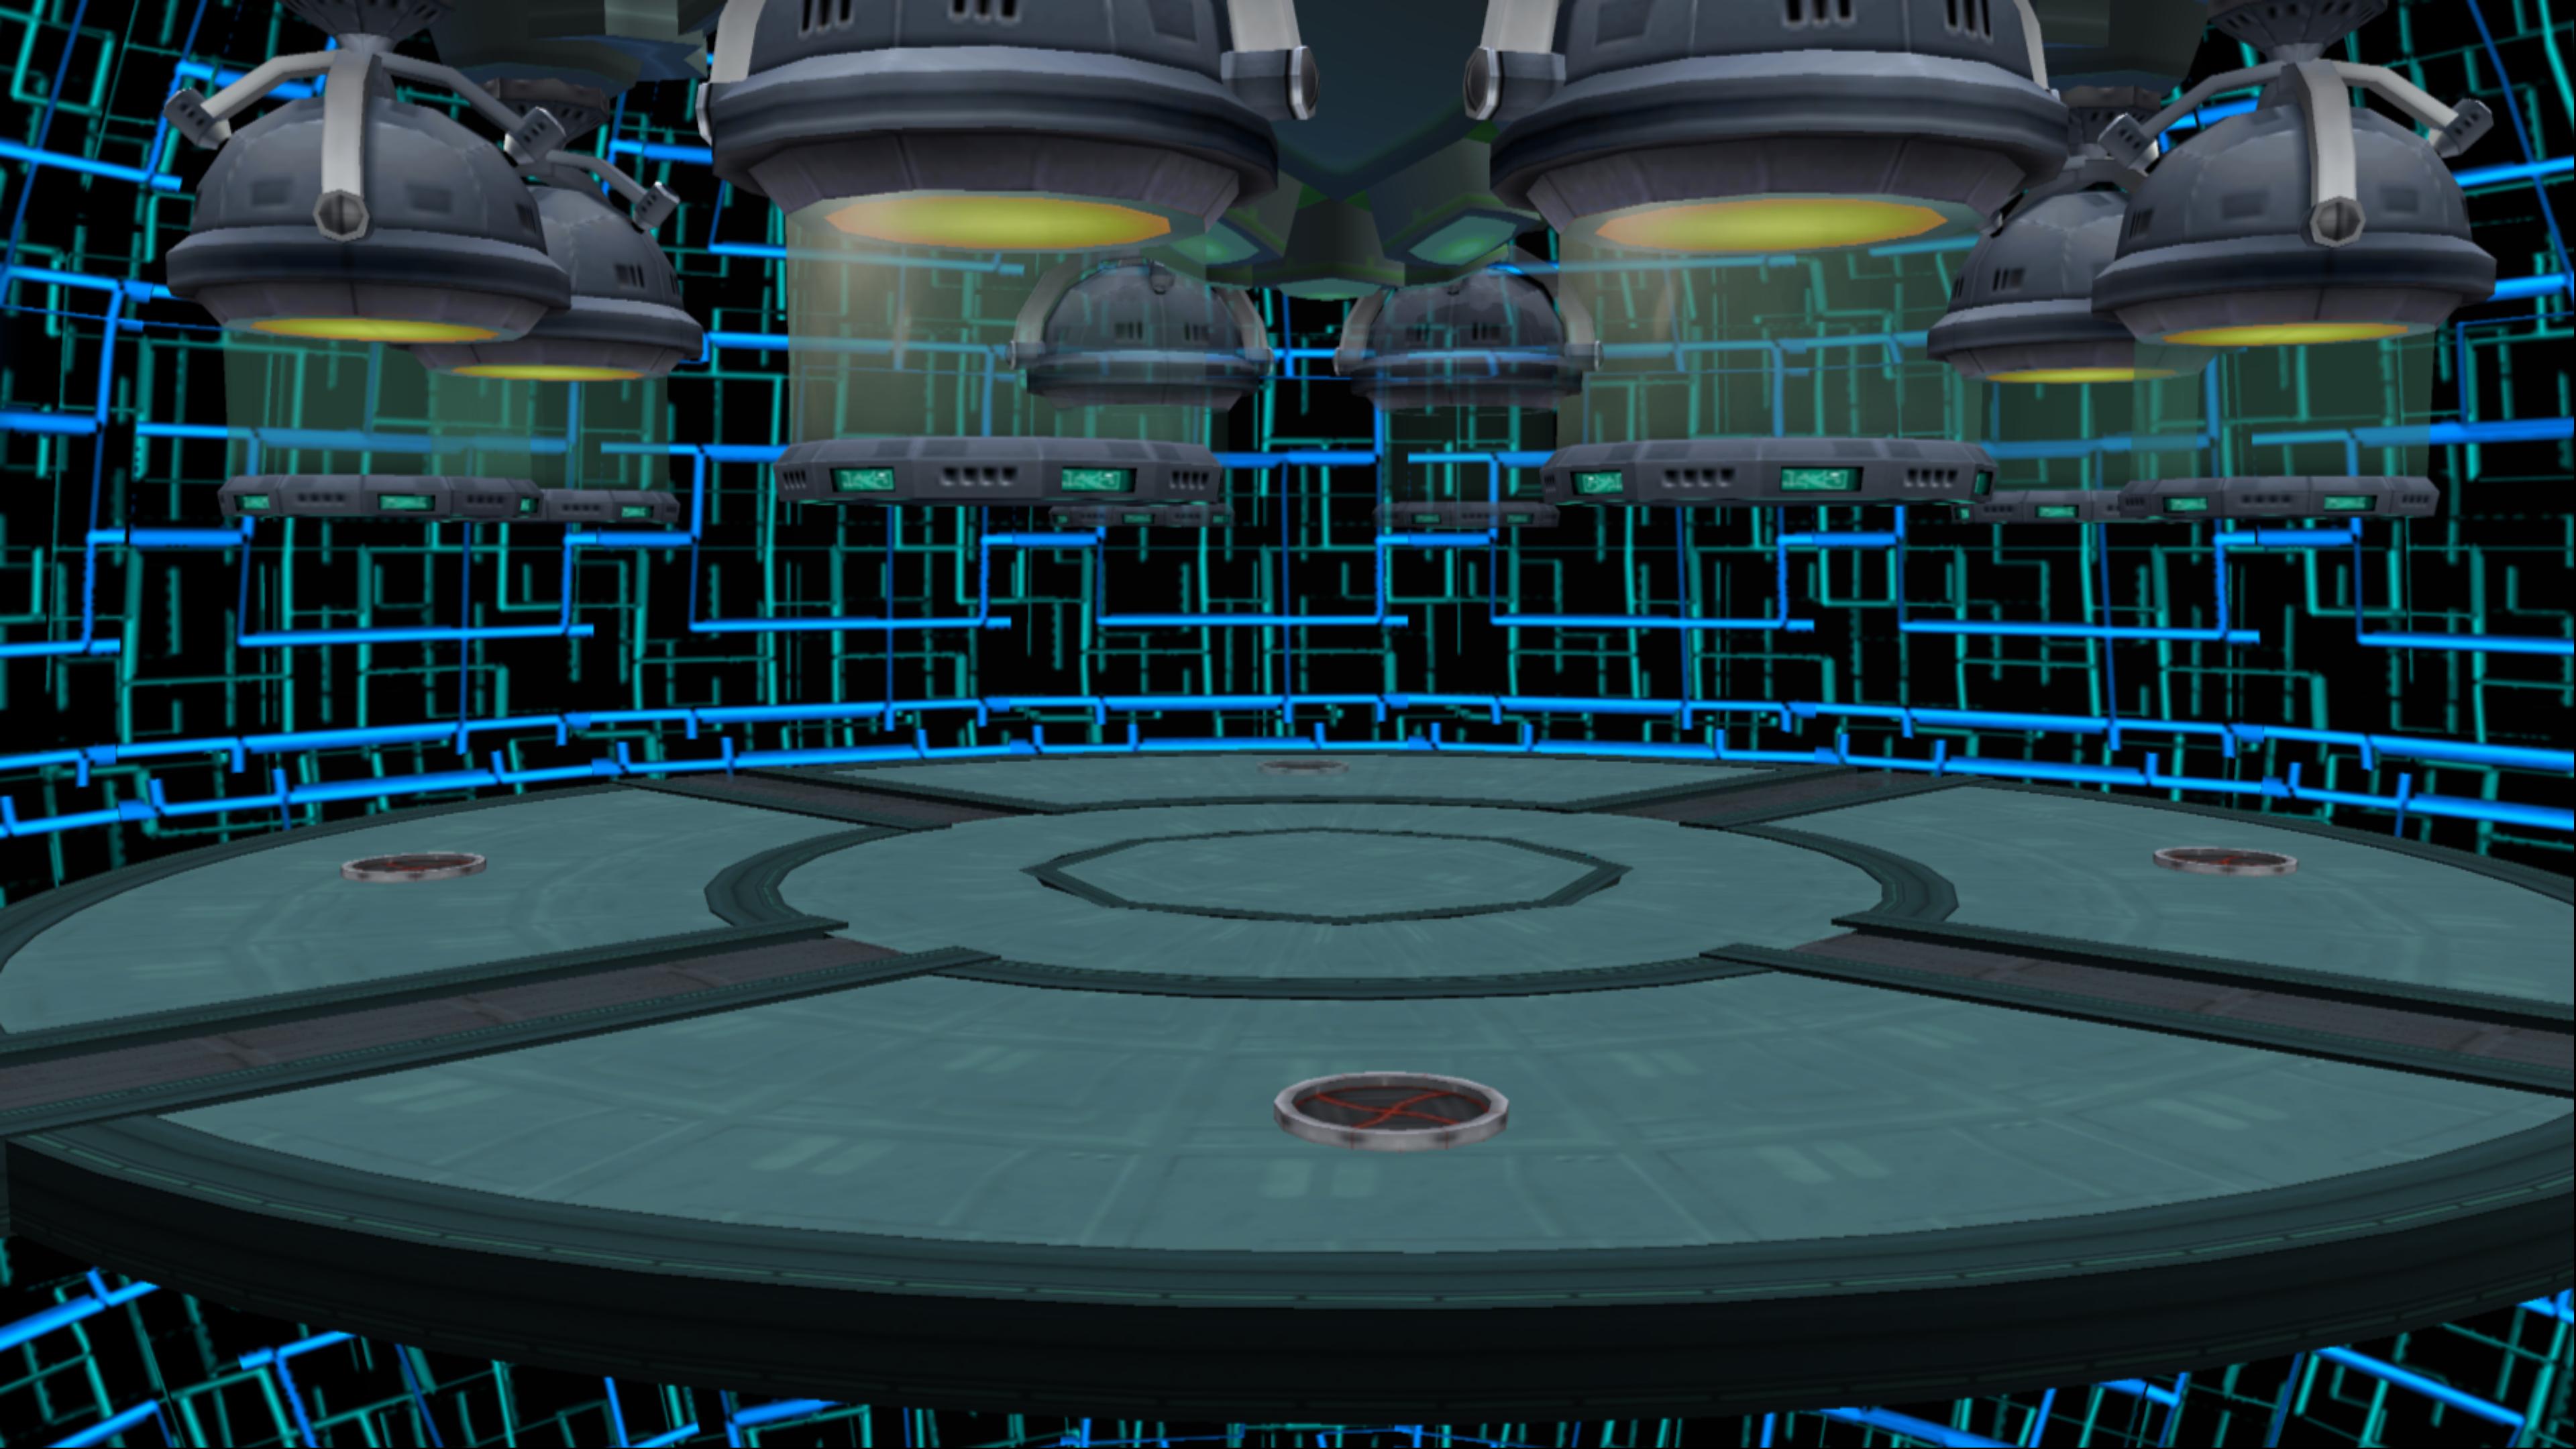 VR deck